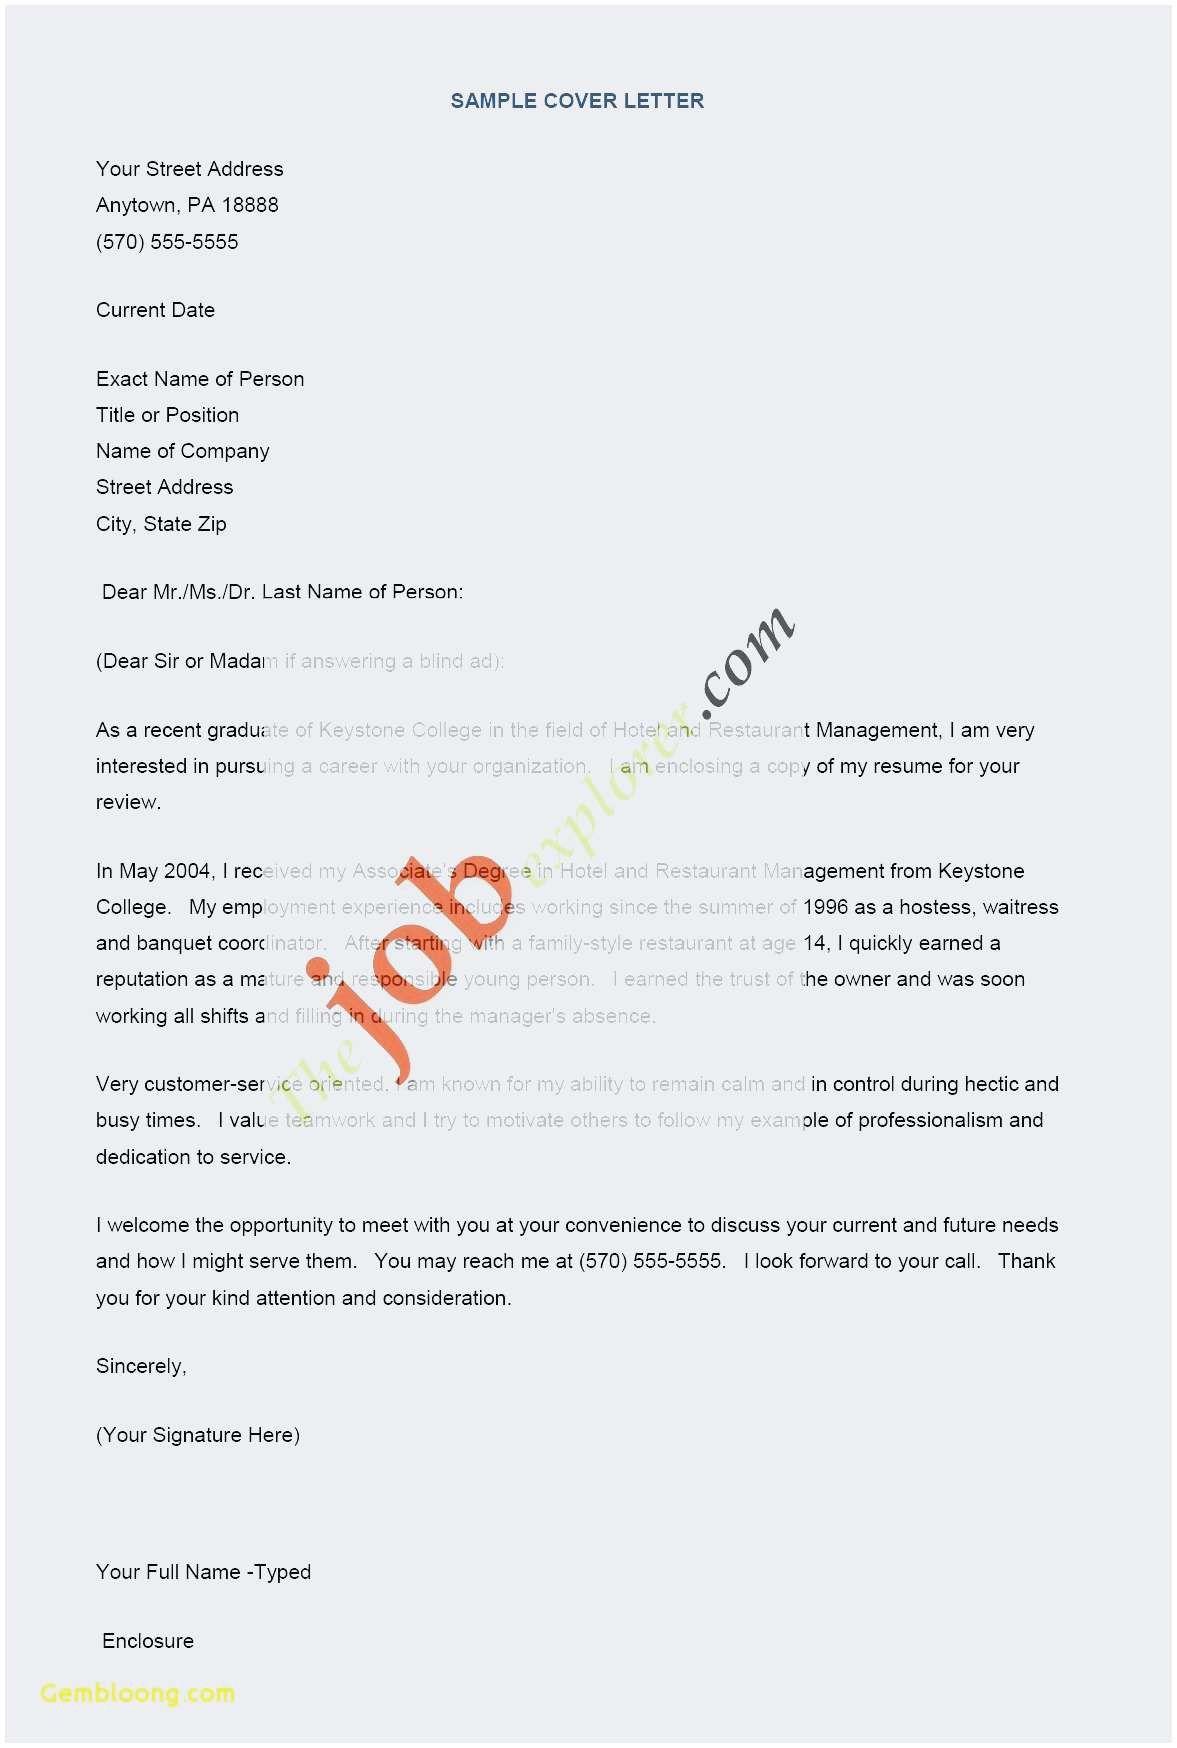 Resume Template Resume Template Free Resume Template Professional Resume Design R In 2020 Cover Letter For Resume Job Cover Letter Writing A Cover Letter